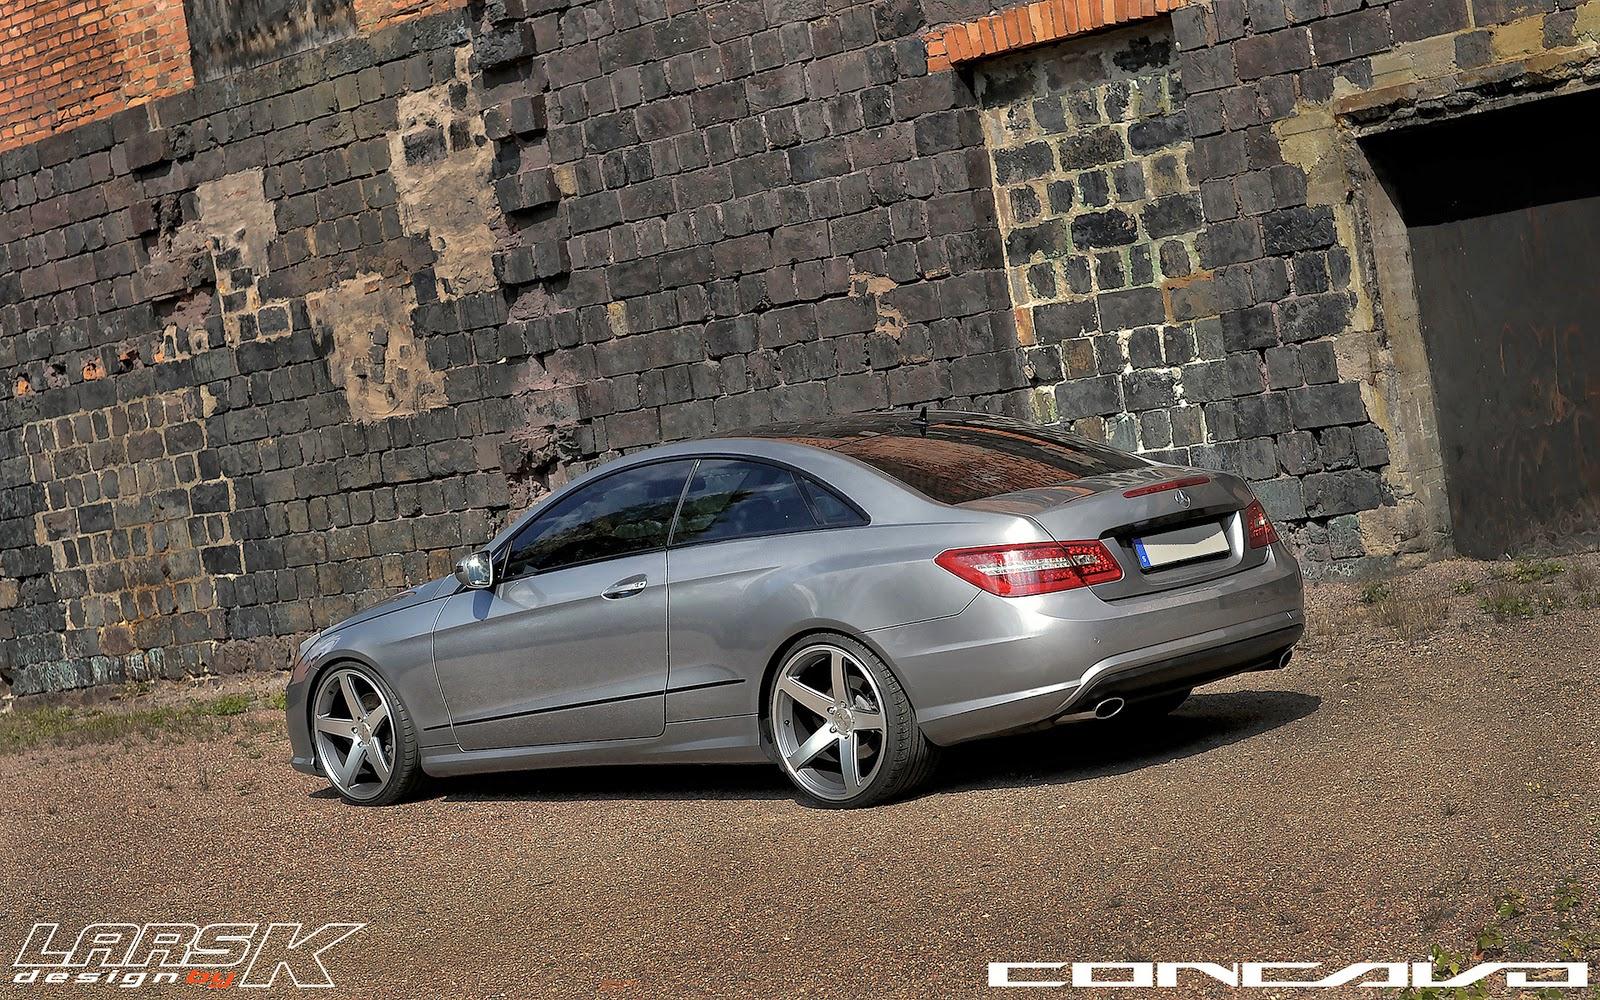 Mercedes-Benz W207 E350 on Concavo CW-5 | BENZTUNING